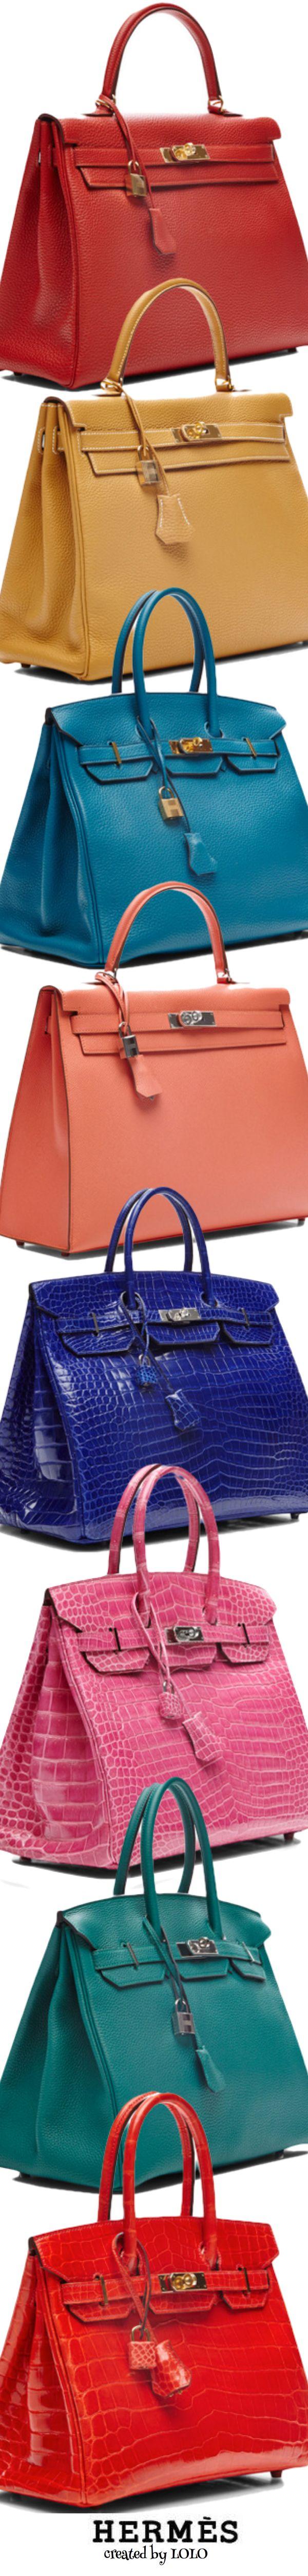 Vintage Hermès via Moda Operandi....one in every color of course | LOLO